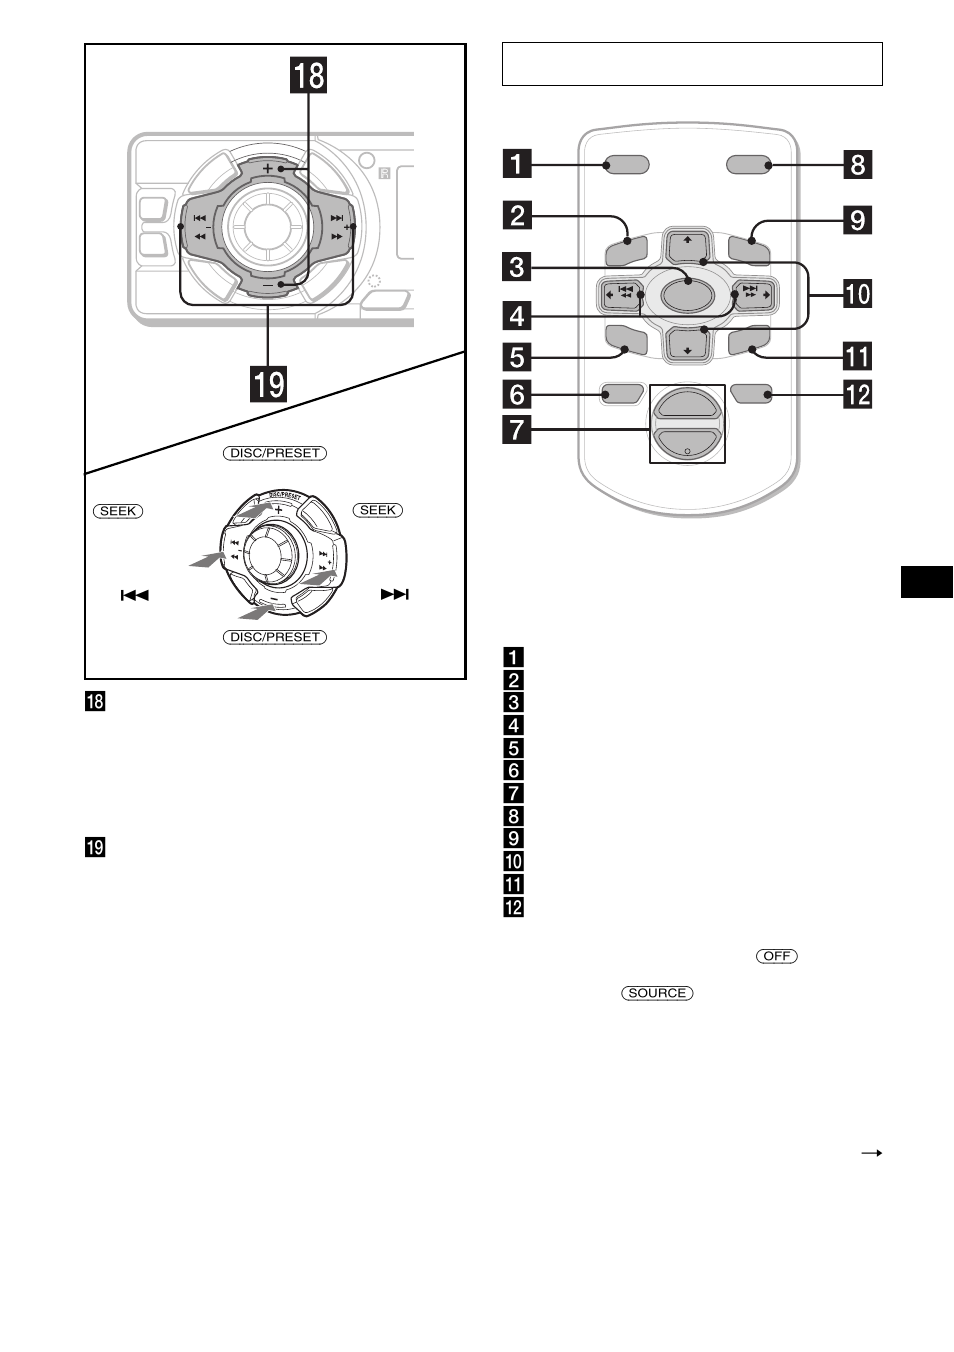 Control remoto de tarjeta rm-x114, Y omitir álbumes   Sony CDX-FW570 User  Manual   Page 35 / 64